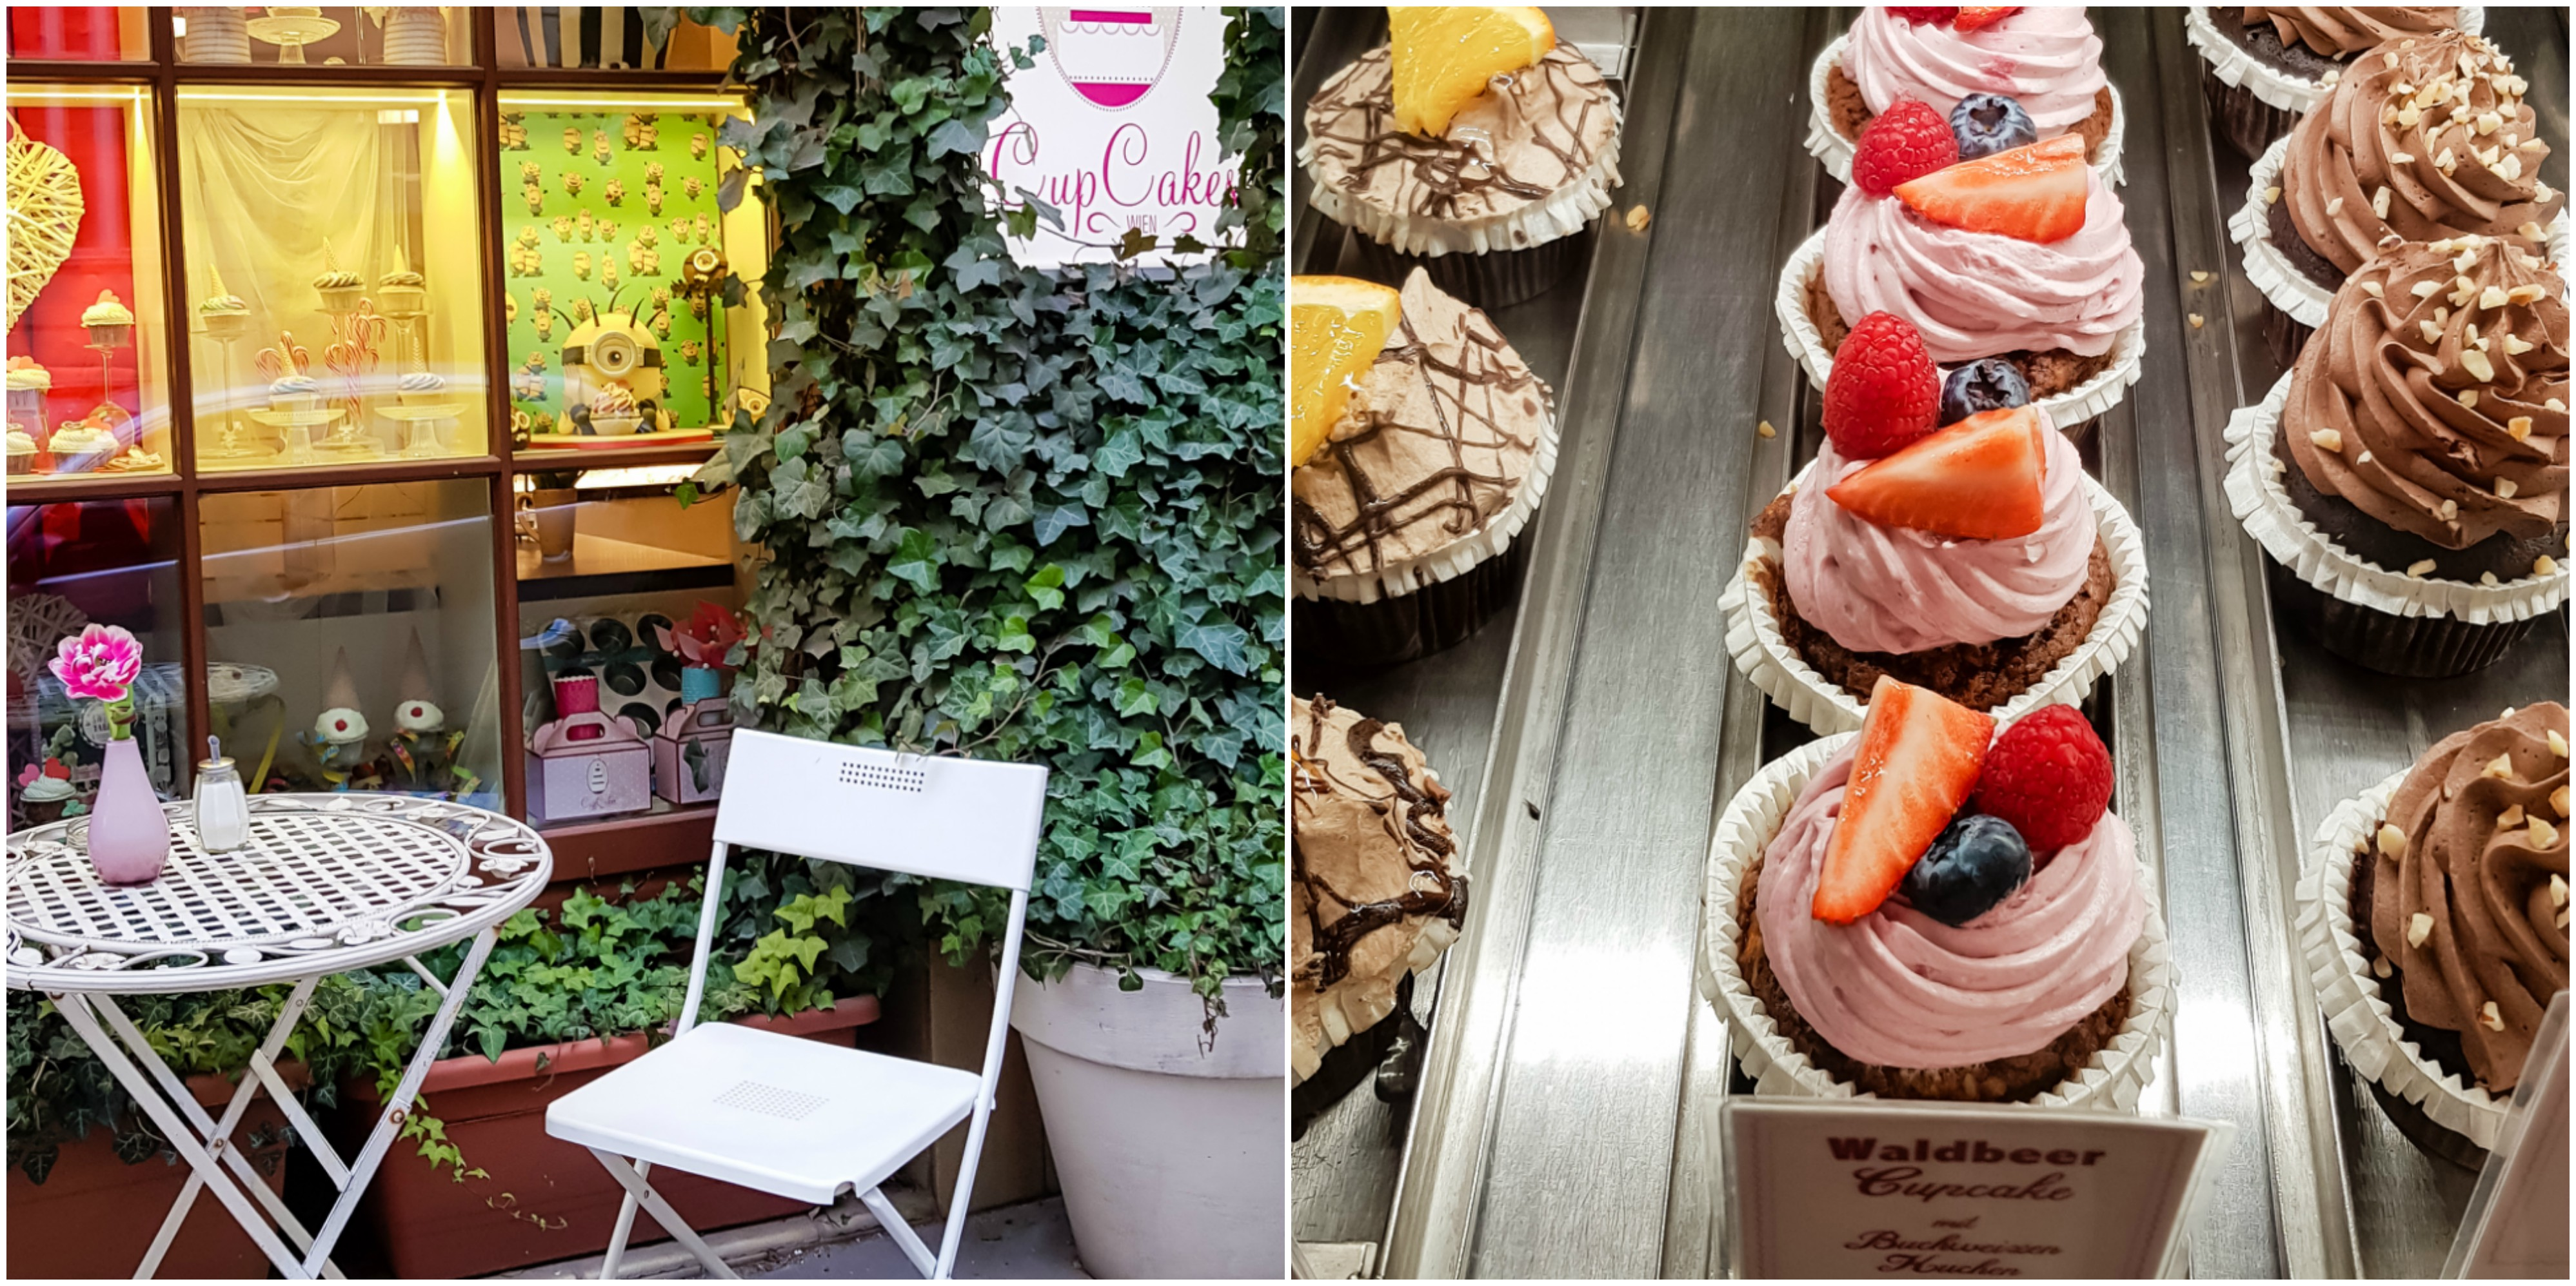 cupcake-wien-vegan-option